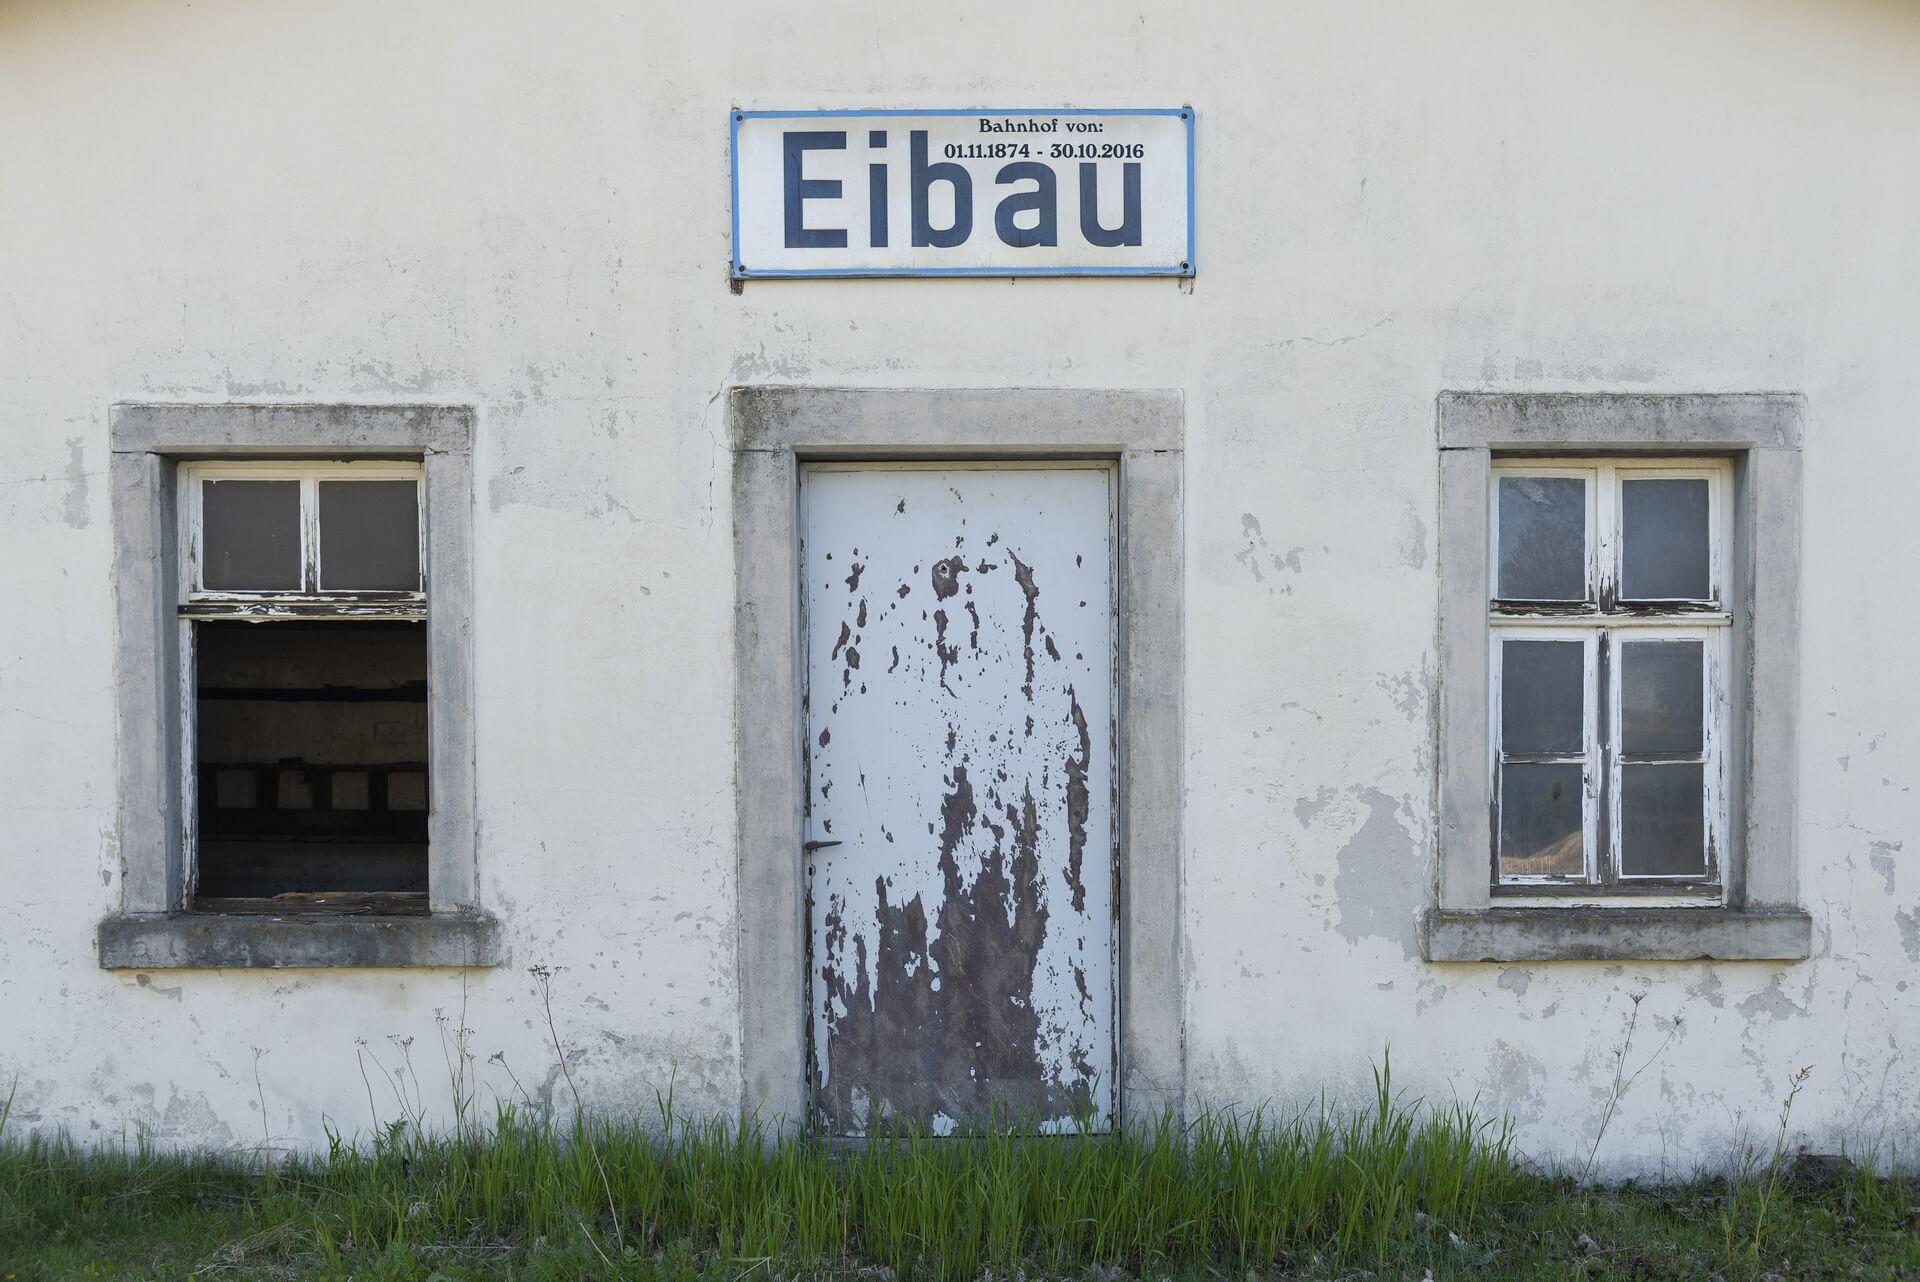 Bahnhof Eibau